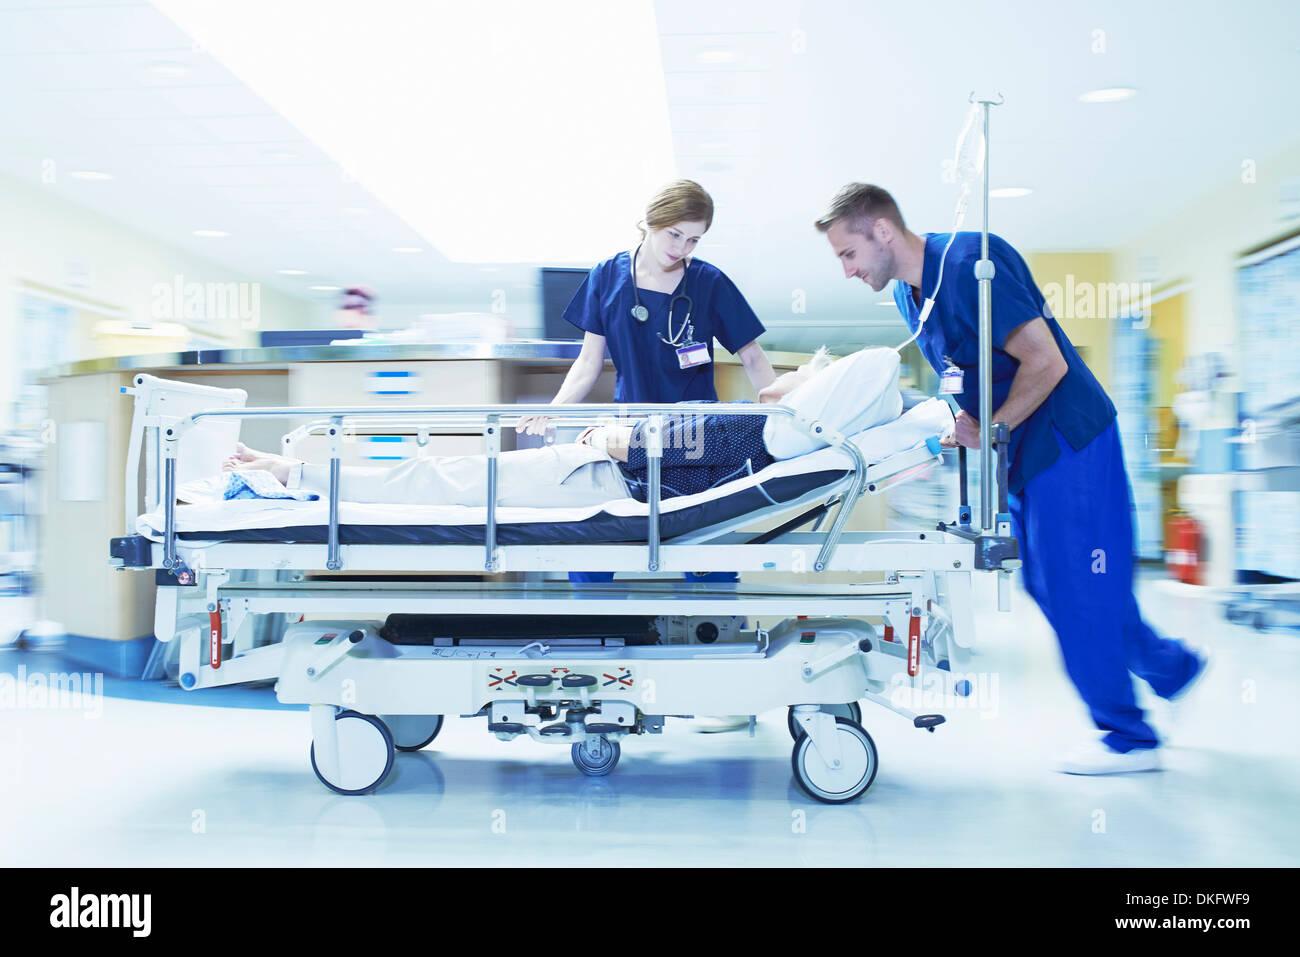 Two medics pushing gurney in hospital emergency room - Stock Image